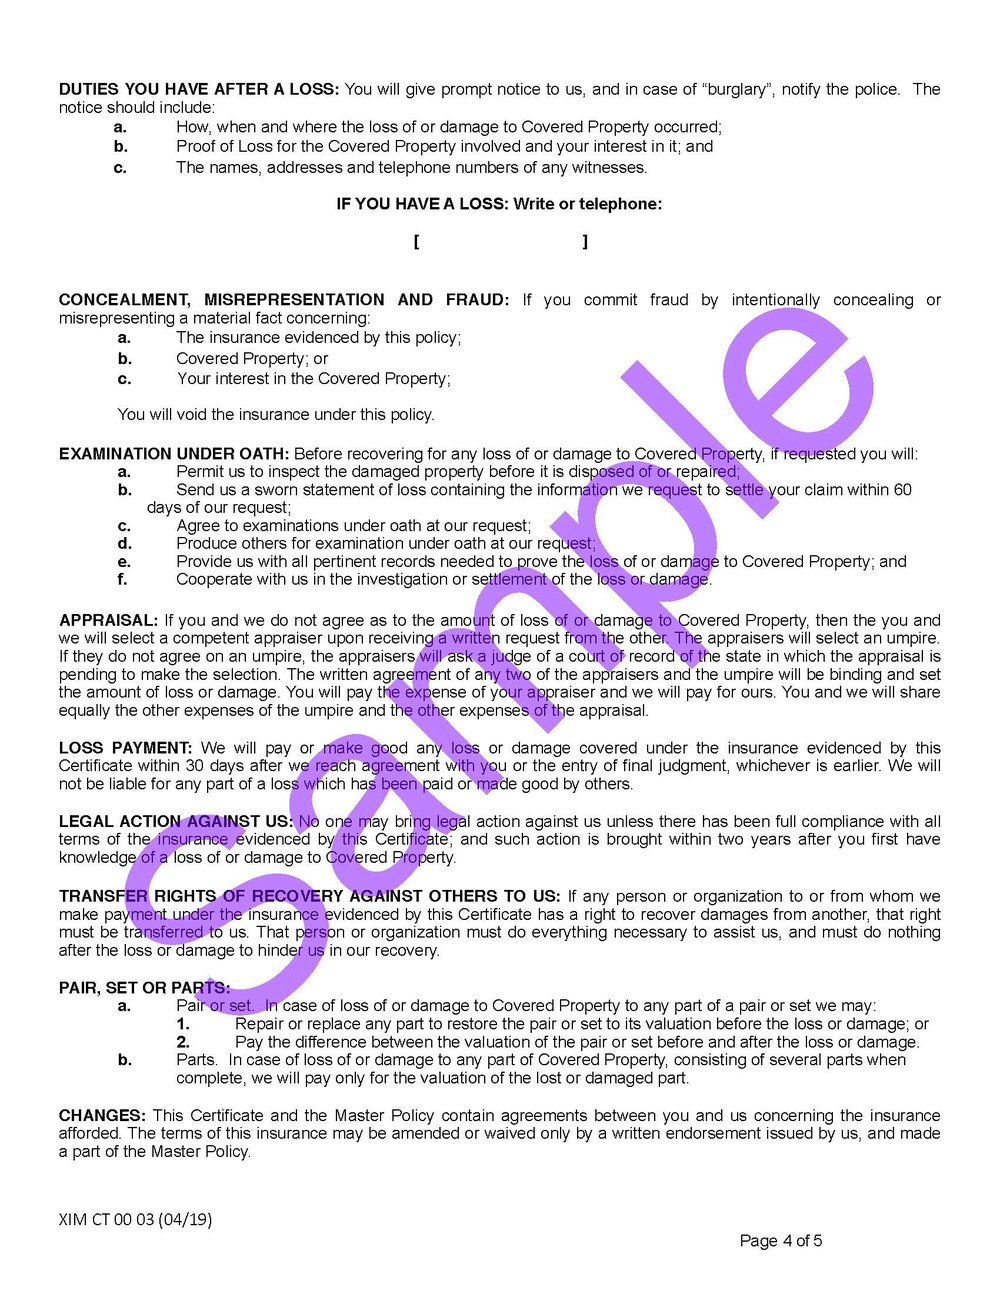 XIM CT 00 03 04 19 Connecticut Certificate of InsuranceSample_Page_4.jpg